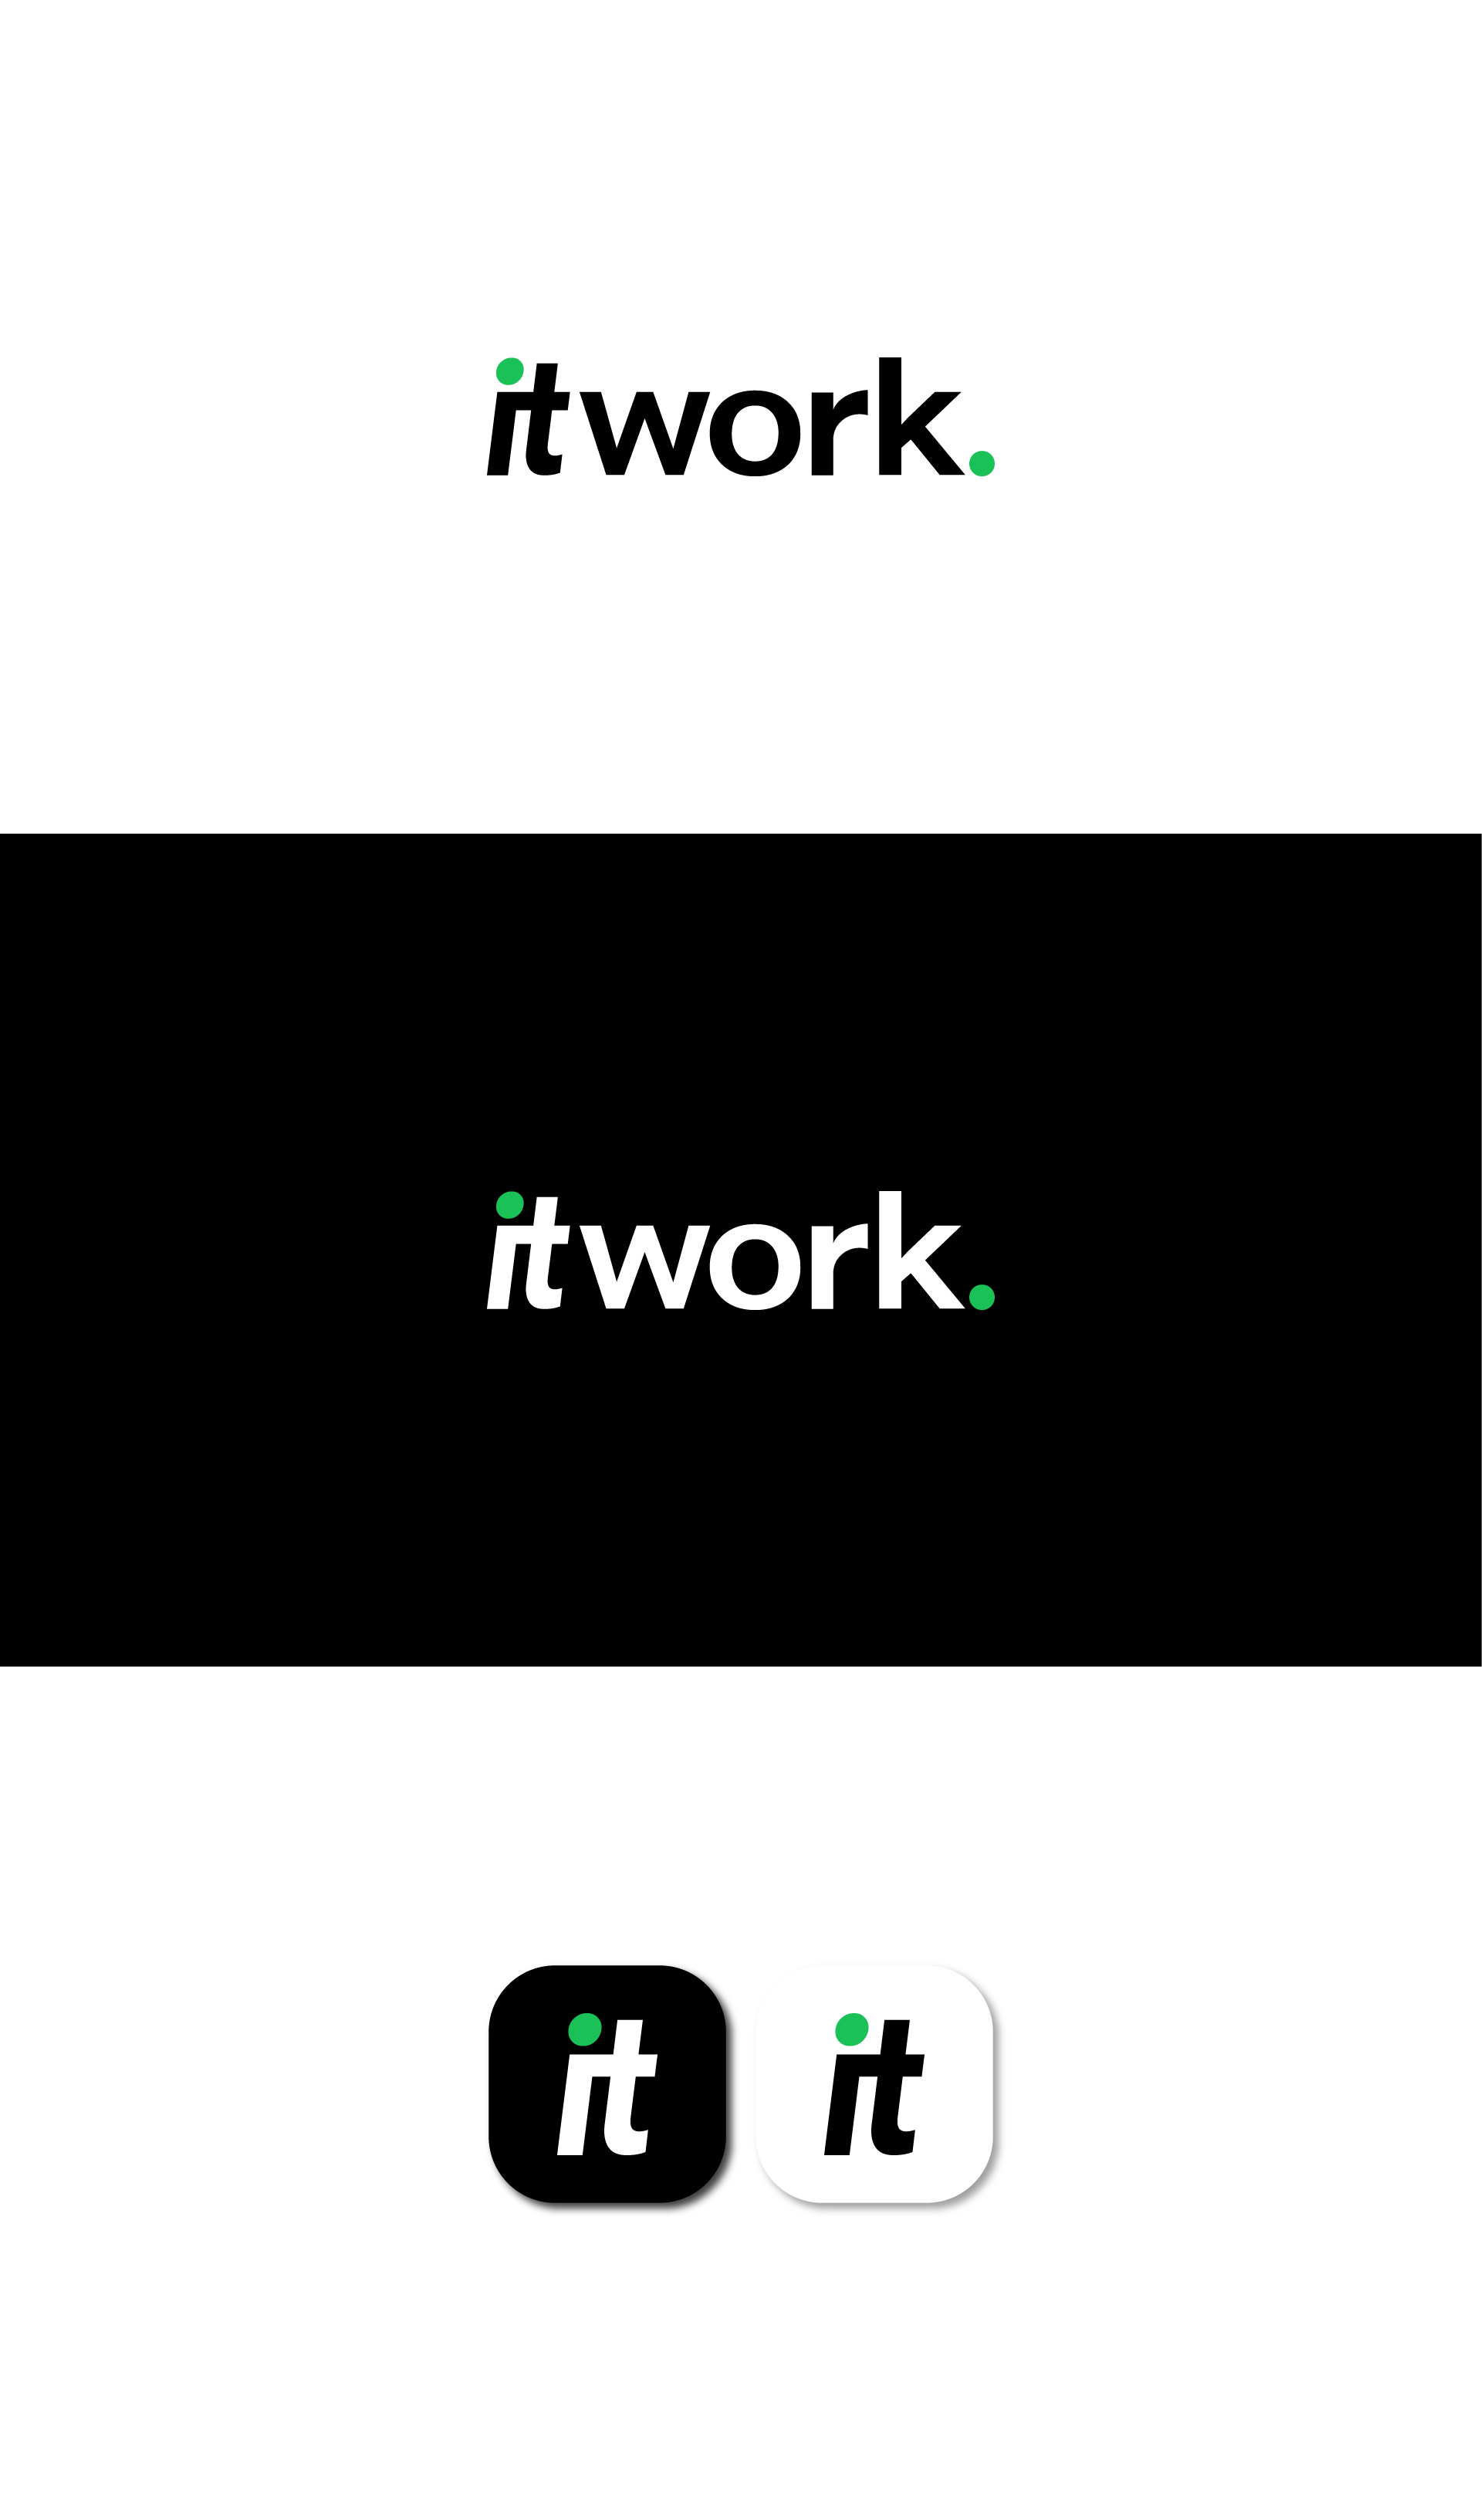 itwork.jpg title=